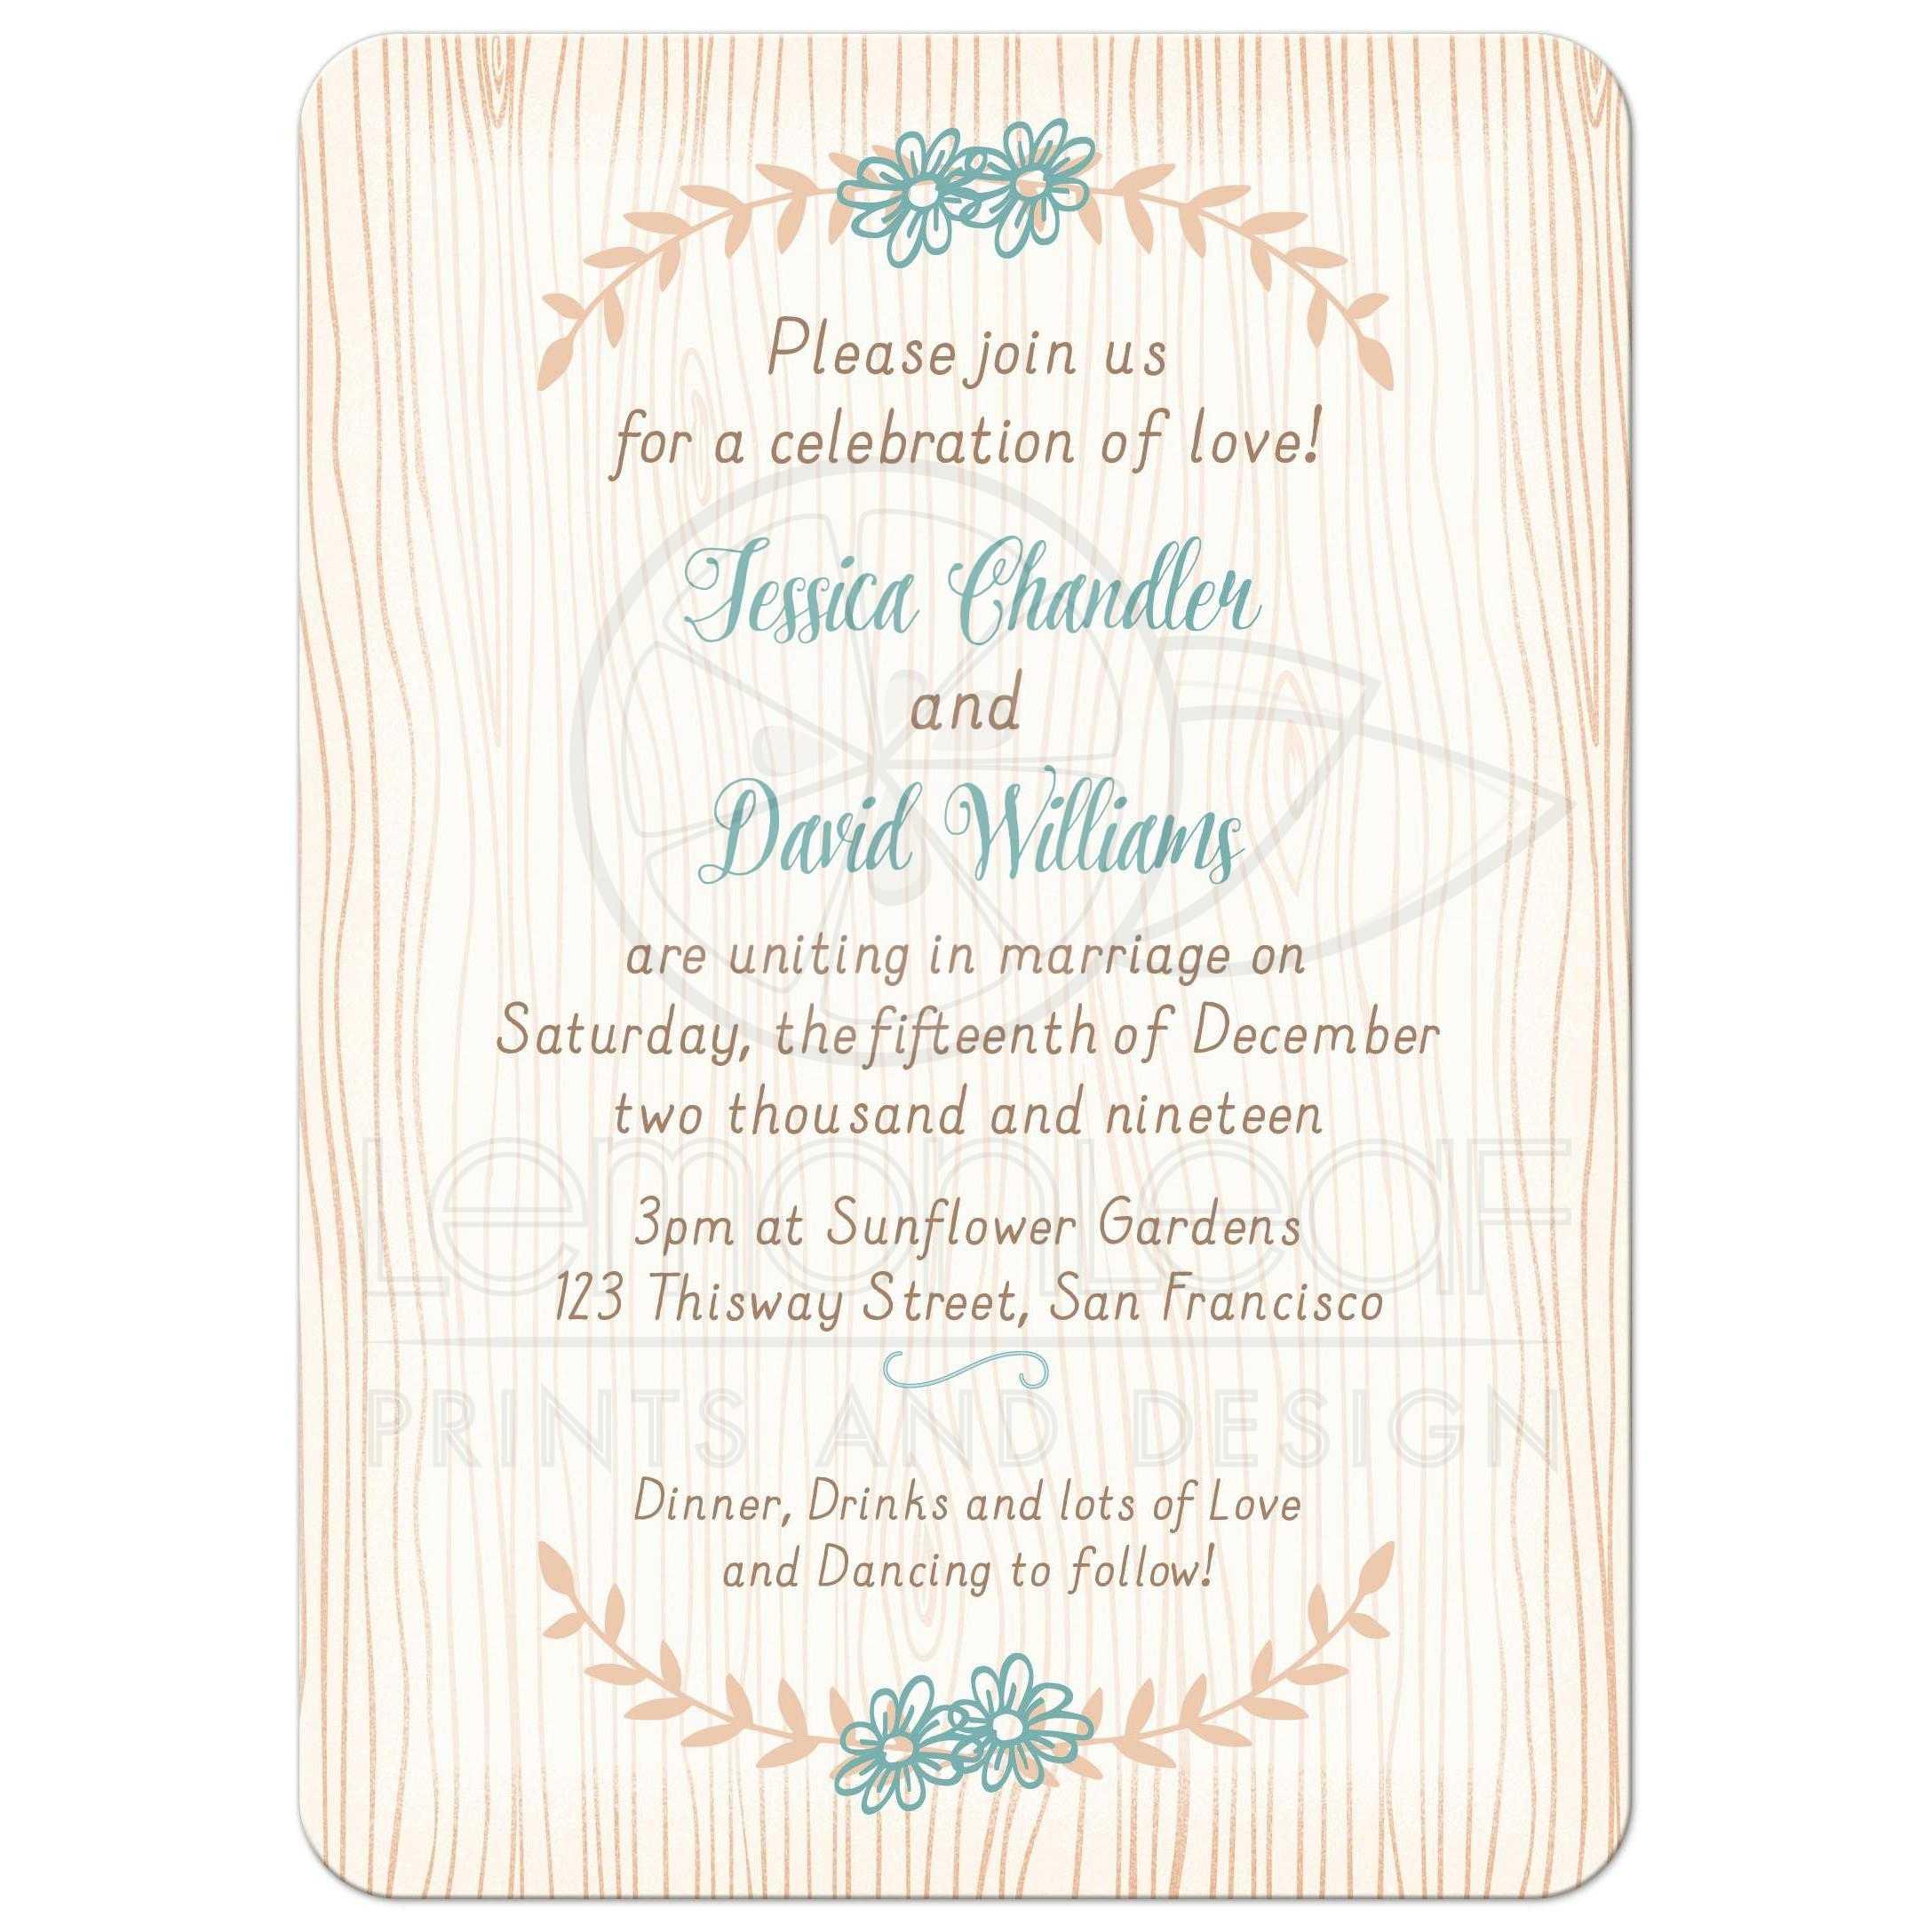 Woodgrain Boho Chic Wedding Invitation